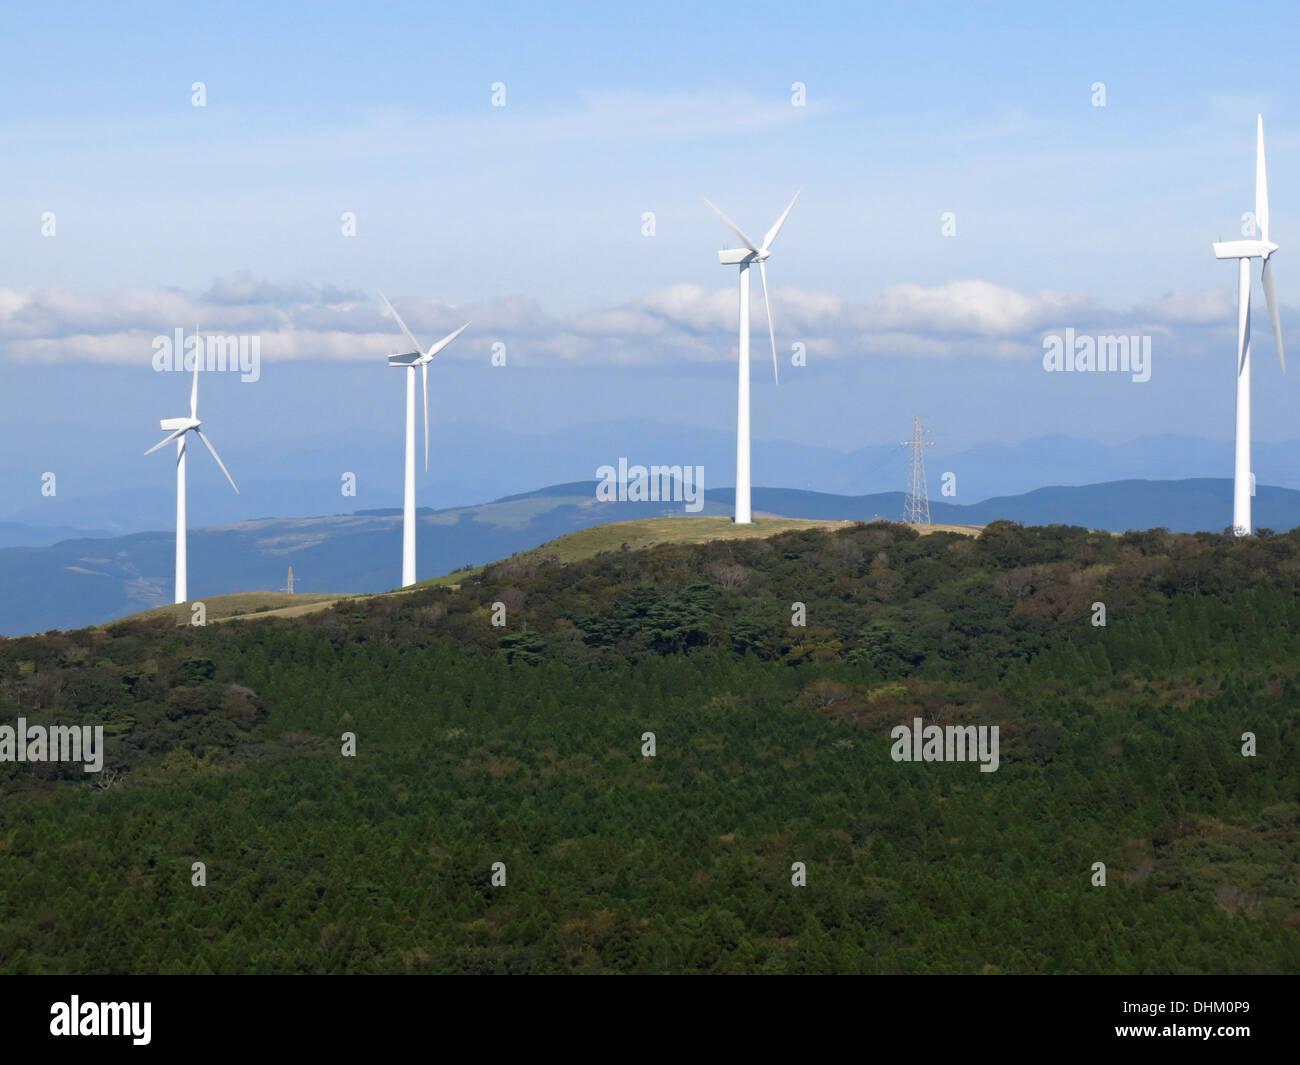 große Windkraftanlagen japan Land-Seite Stockbild